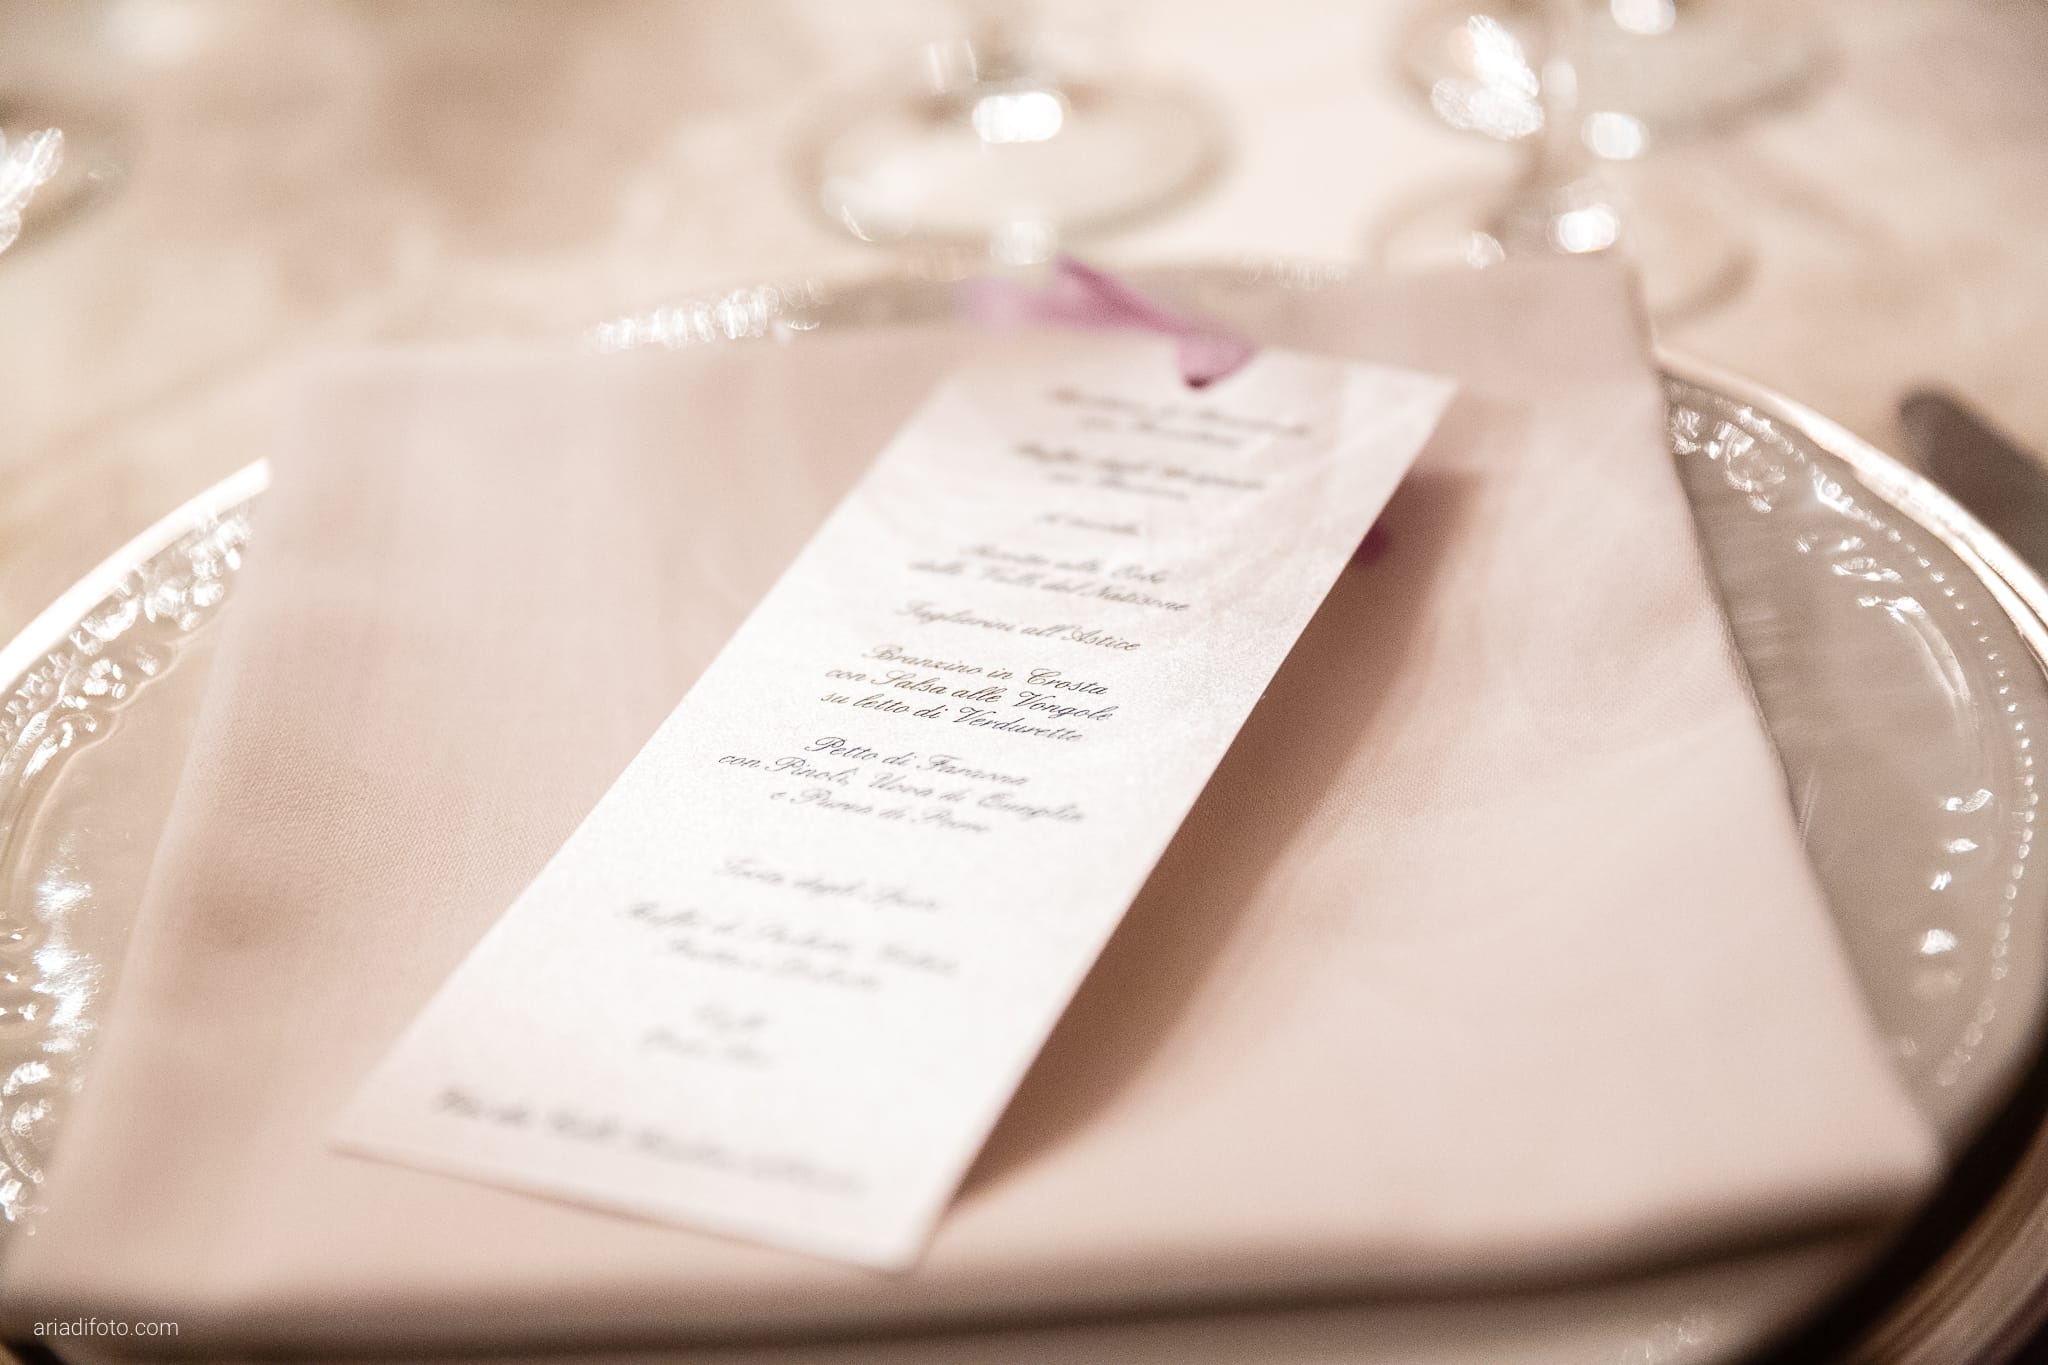 Donatella Enrico matrimonio Castello Duino Trieste ricevimento dettagli menu